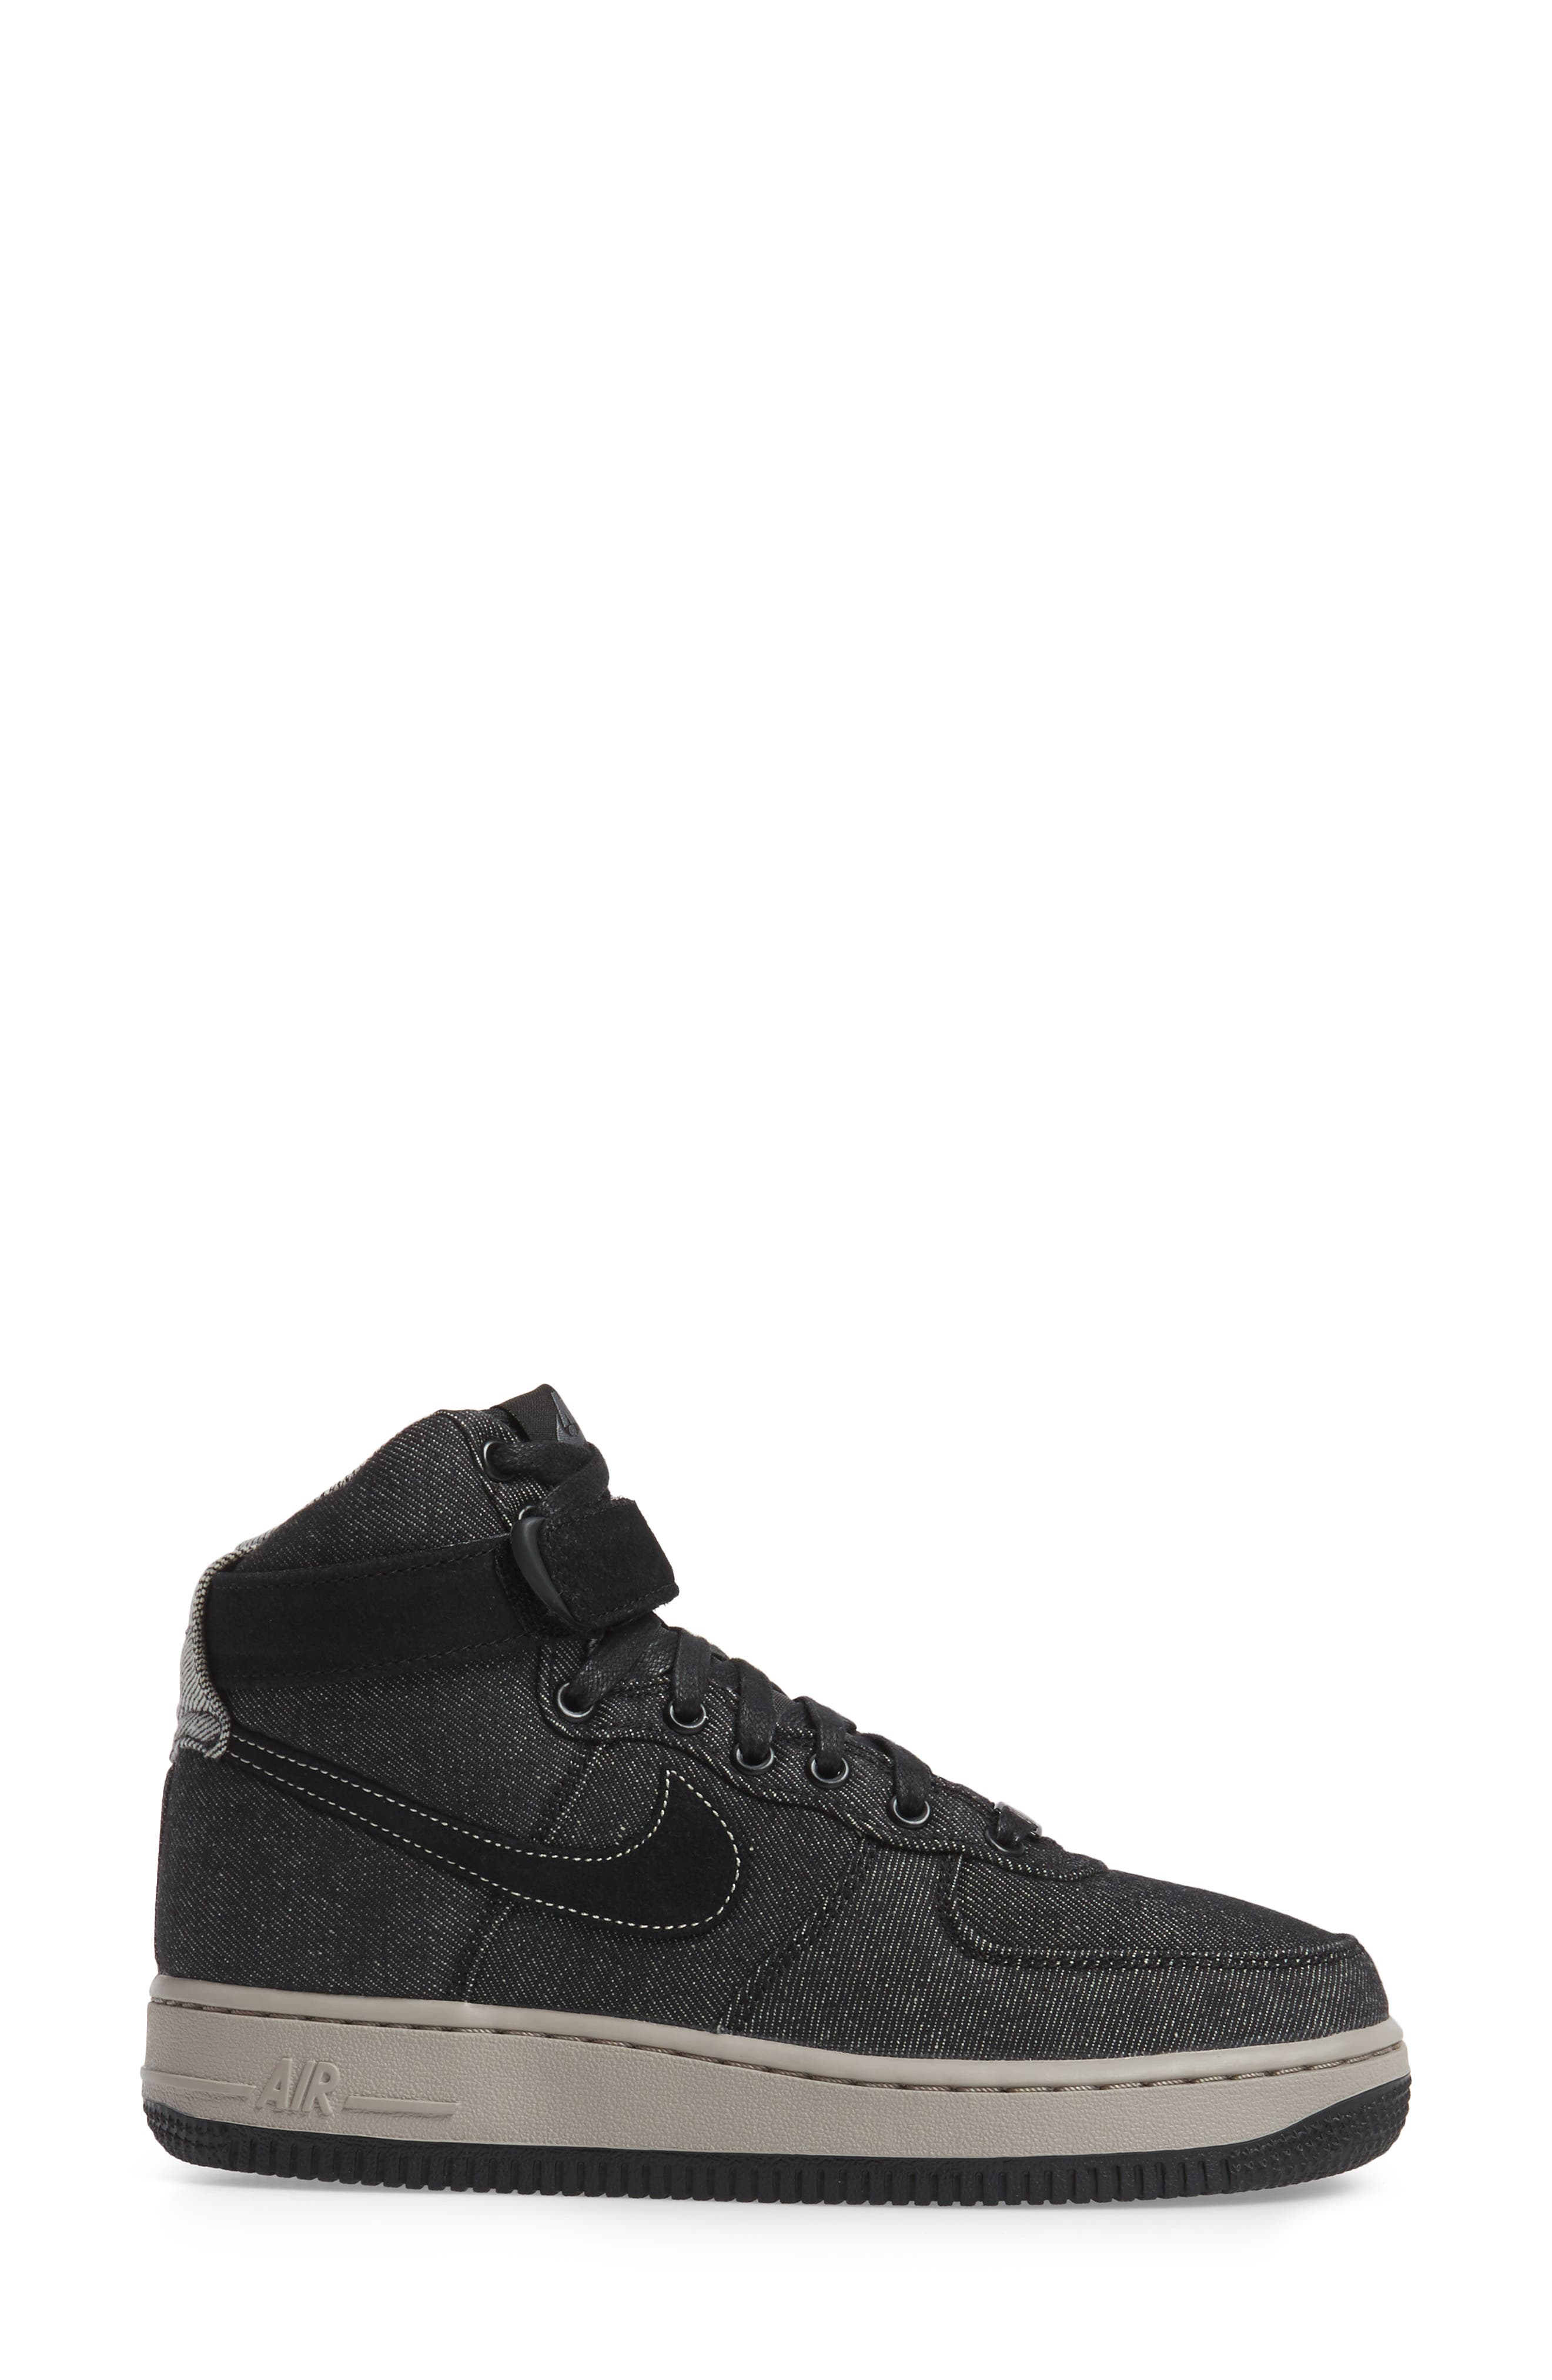 Alternate Image 3  - Nike Air Force 1 High Top SE Sneaker (Women)